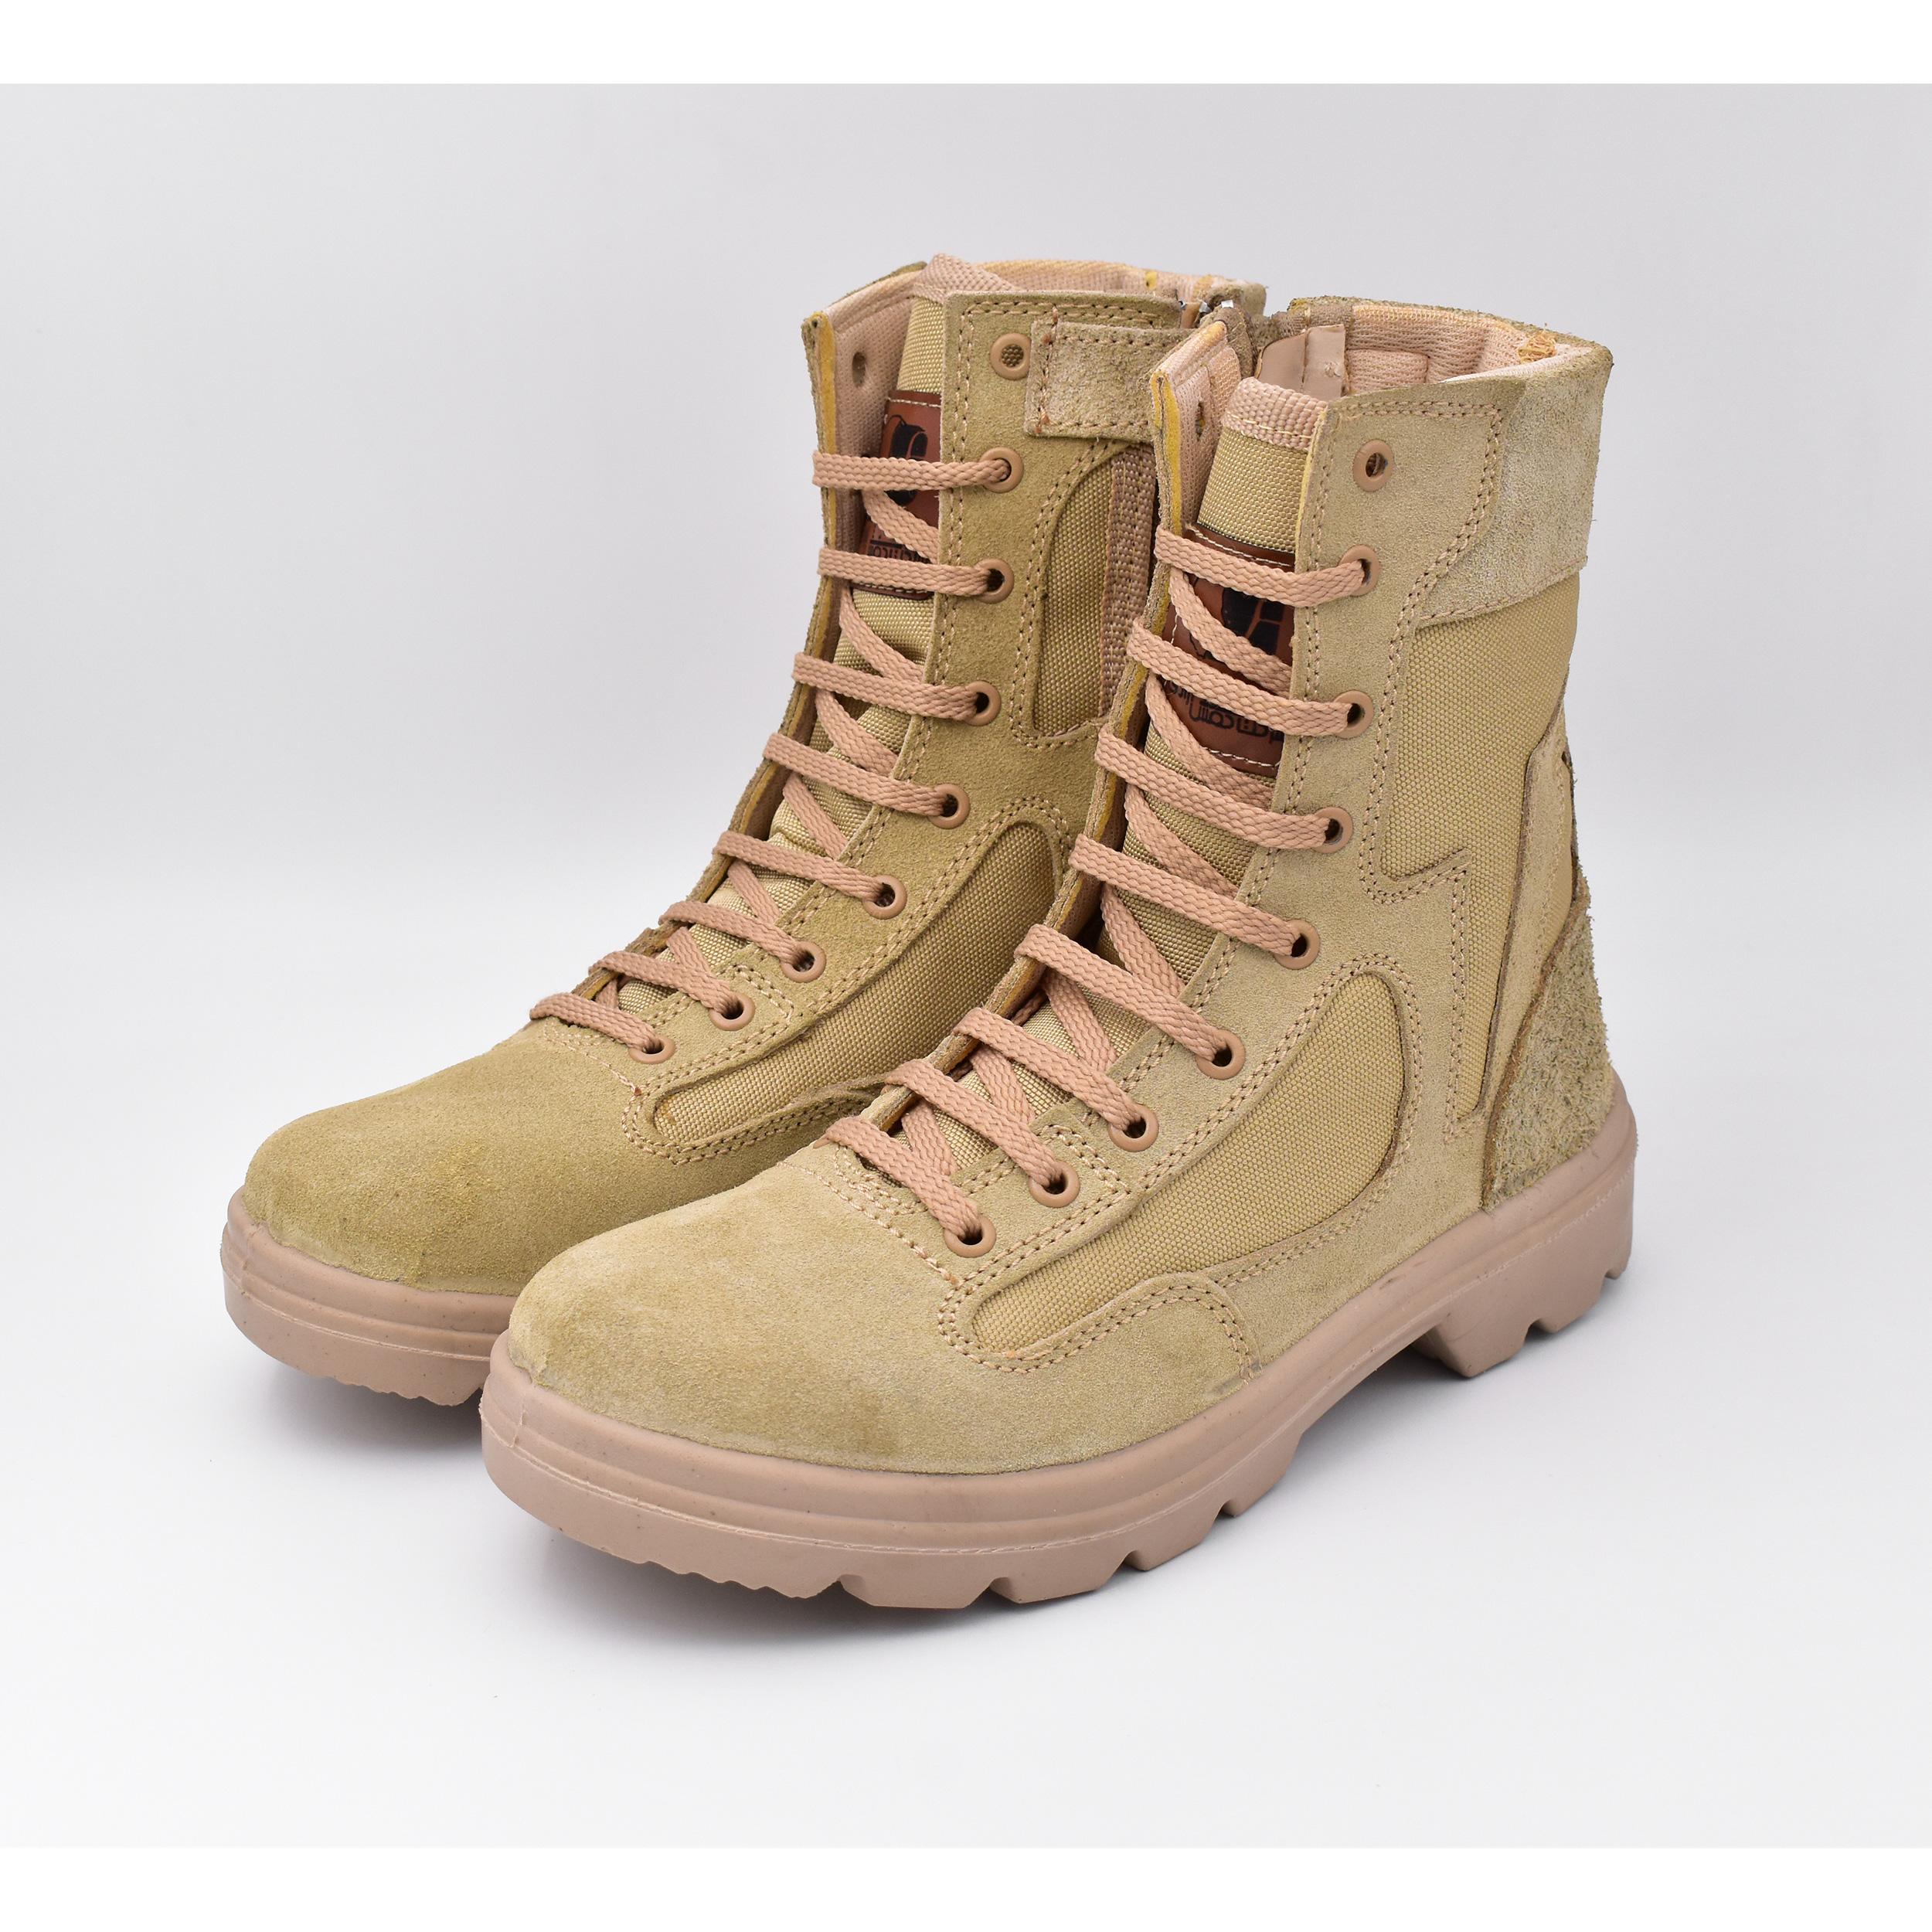 کفش کوهنوردی مردانه مدل Razm کد 8485 main 1 6